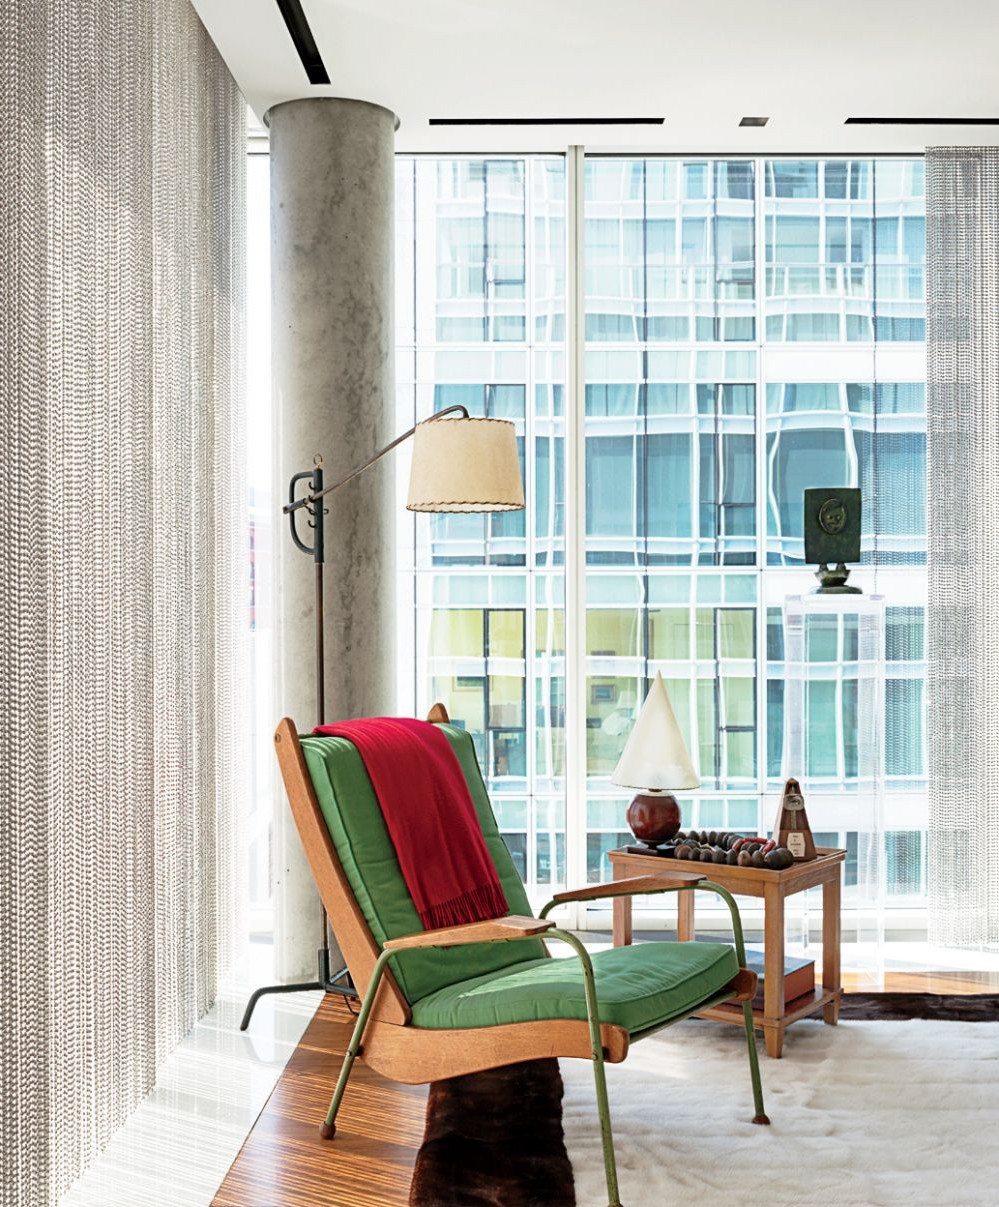 preston phillips interior design reading chaise floor lamp rug green upholstery curtains